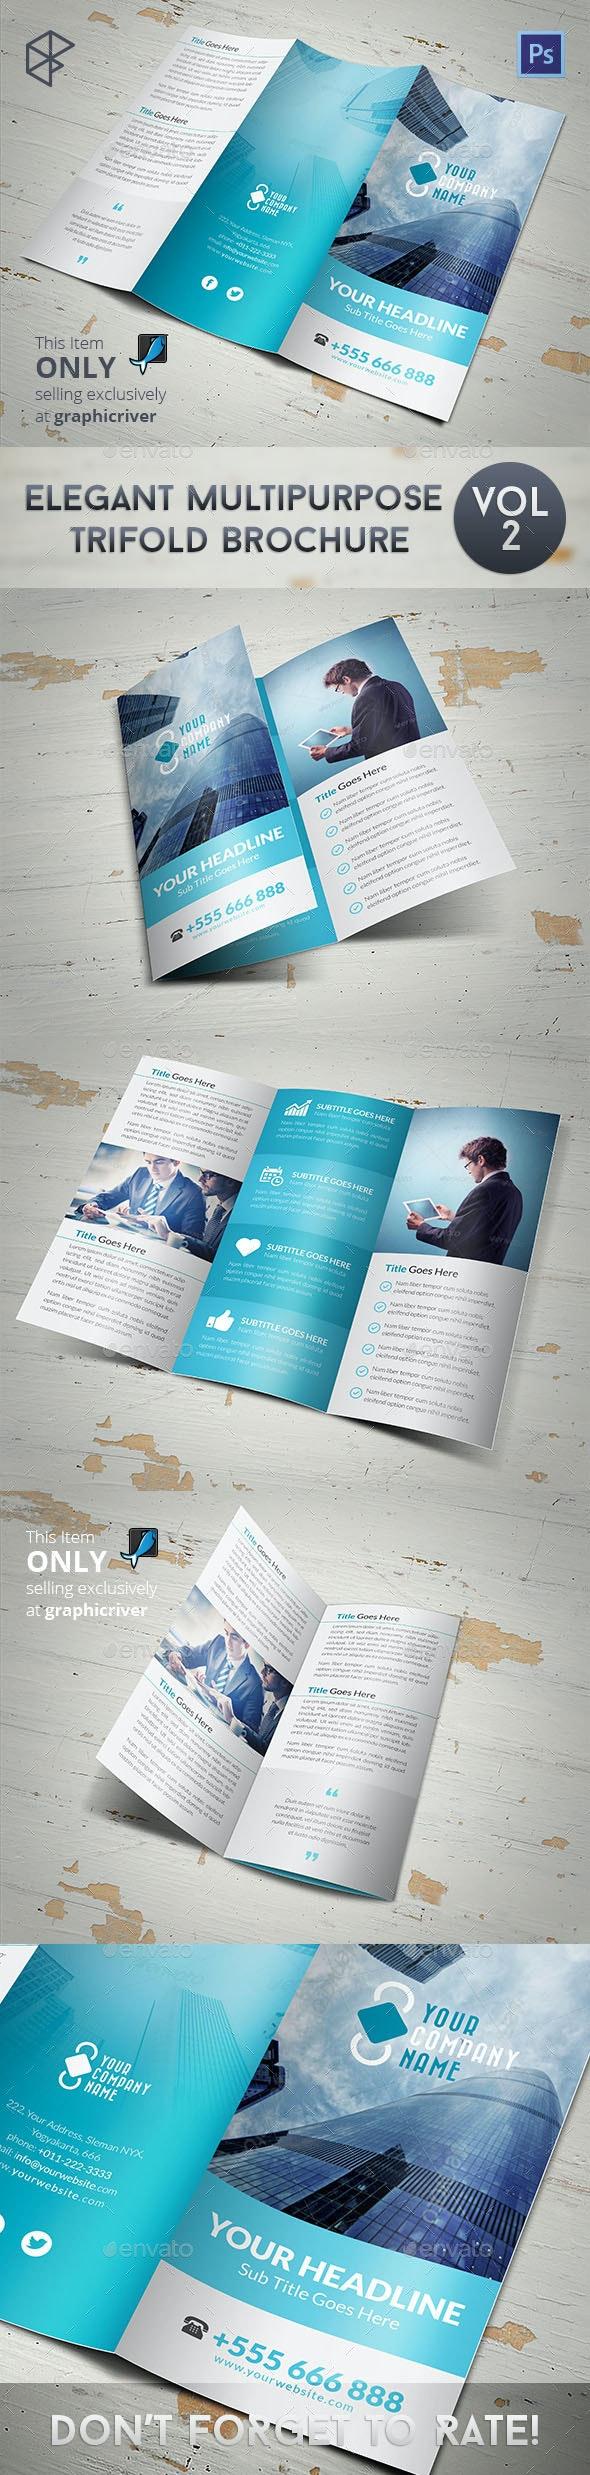 Elegant Multipurpose Trifold Brochure Vol 2 - Corporate Brochures